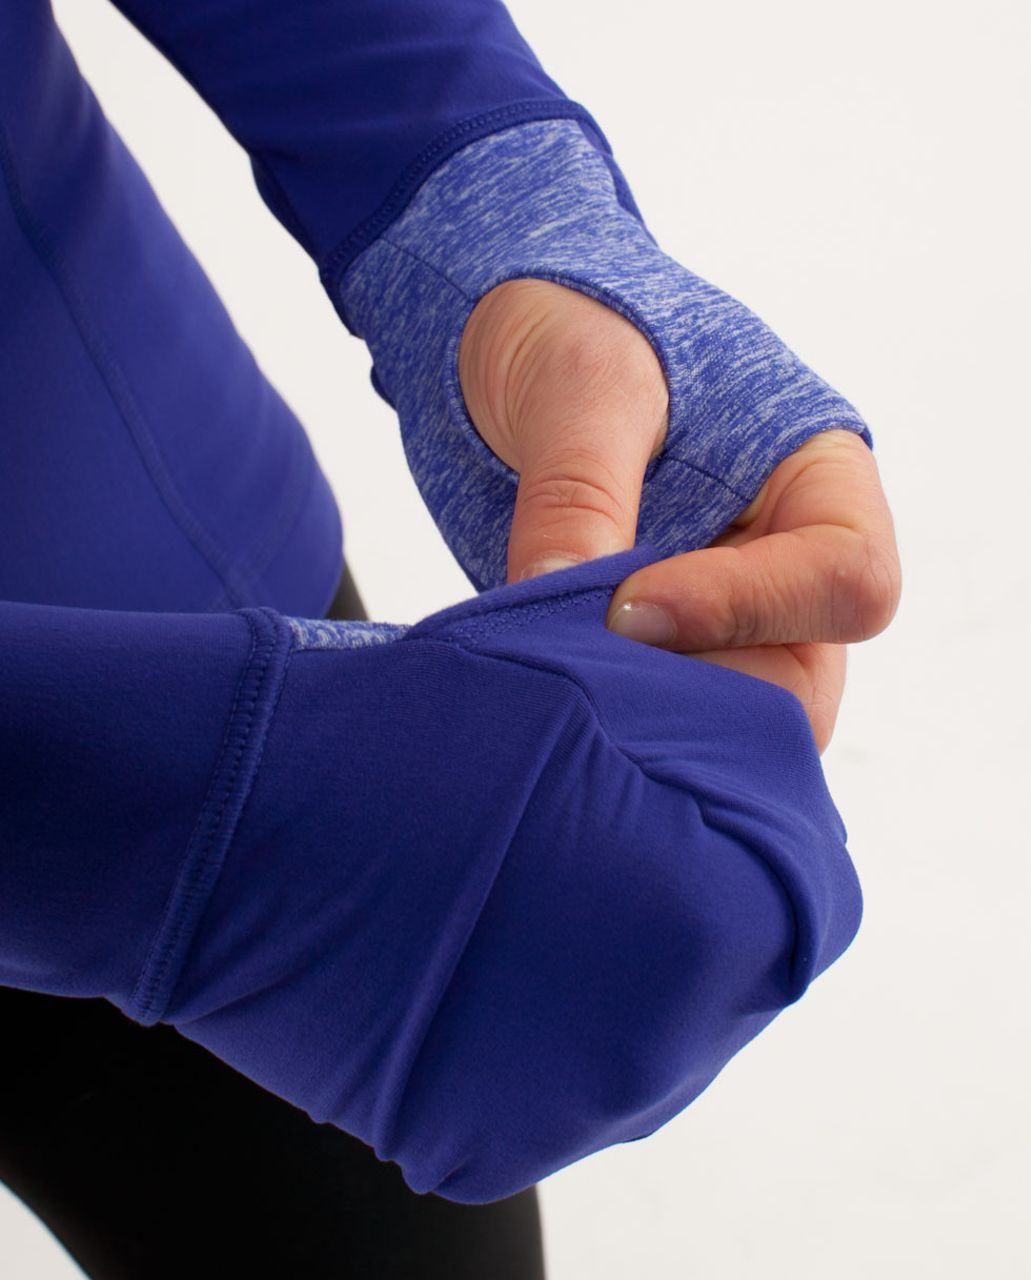 Lululemon Run:  Distance Pullover - Pigment Blue /  Heathered Pigment Blue